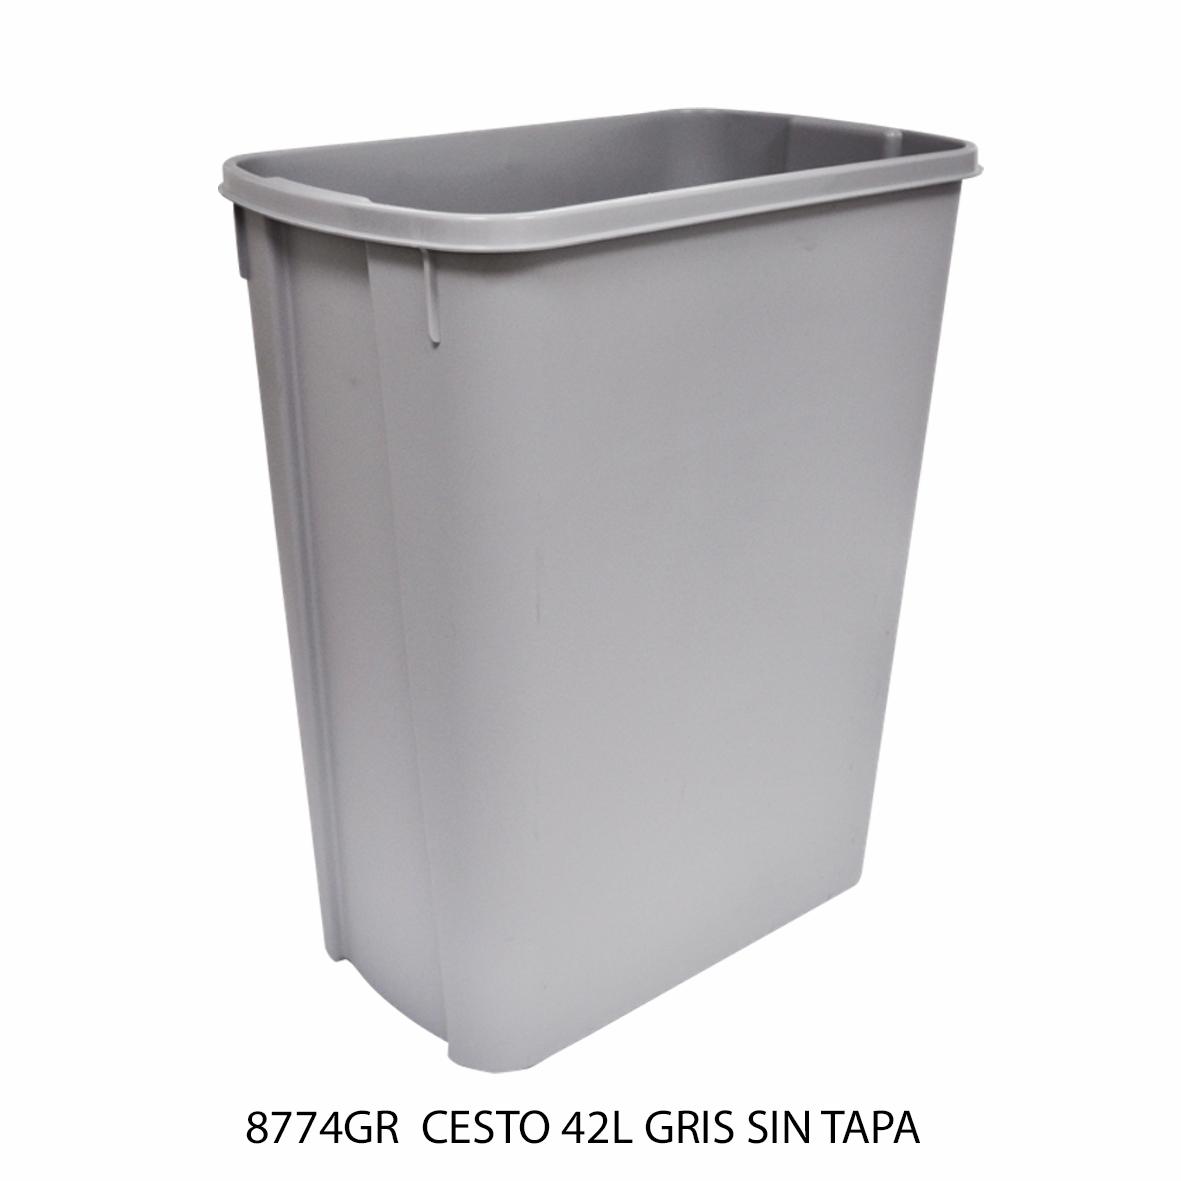 Bote de basura mediano de 42 litros sin tapa color gris modelo 8774GR de Sablón